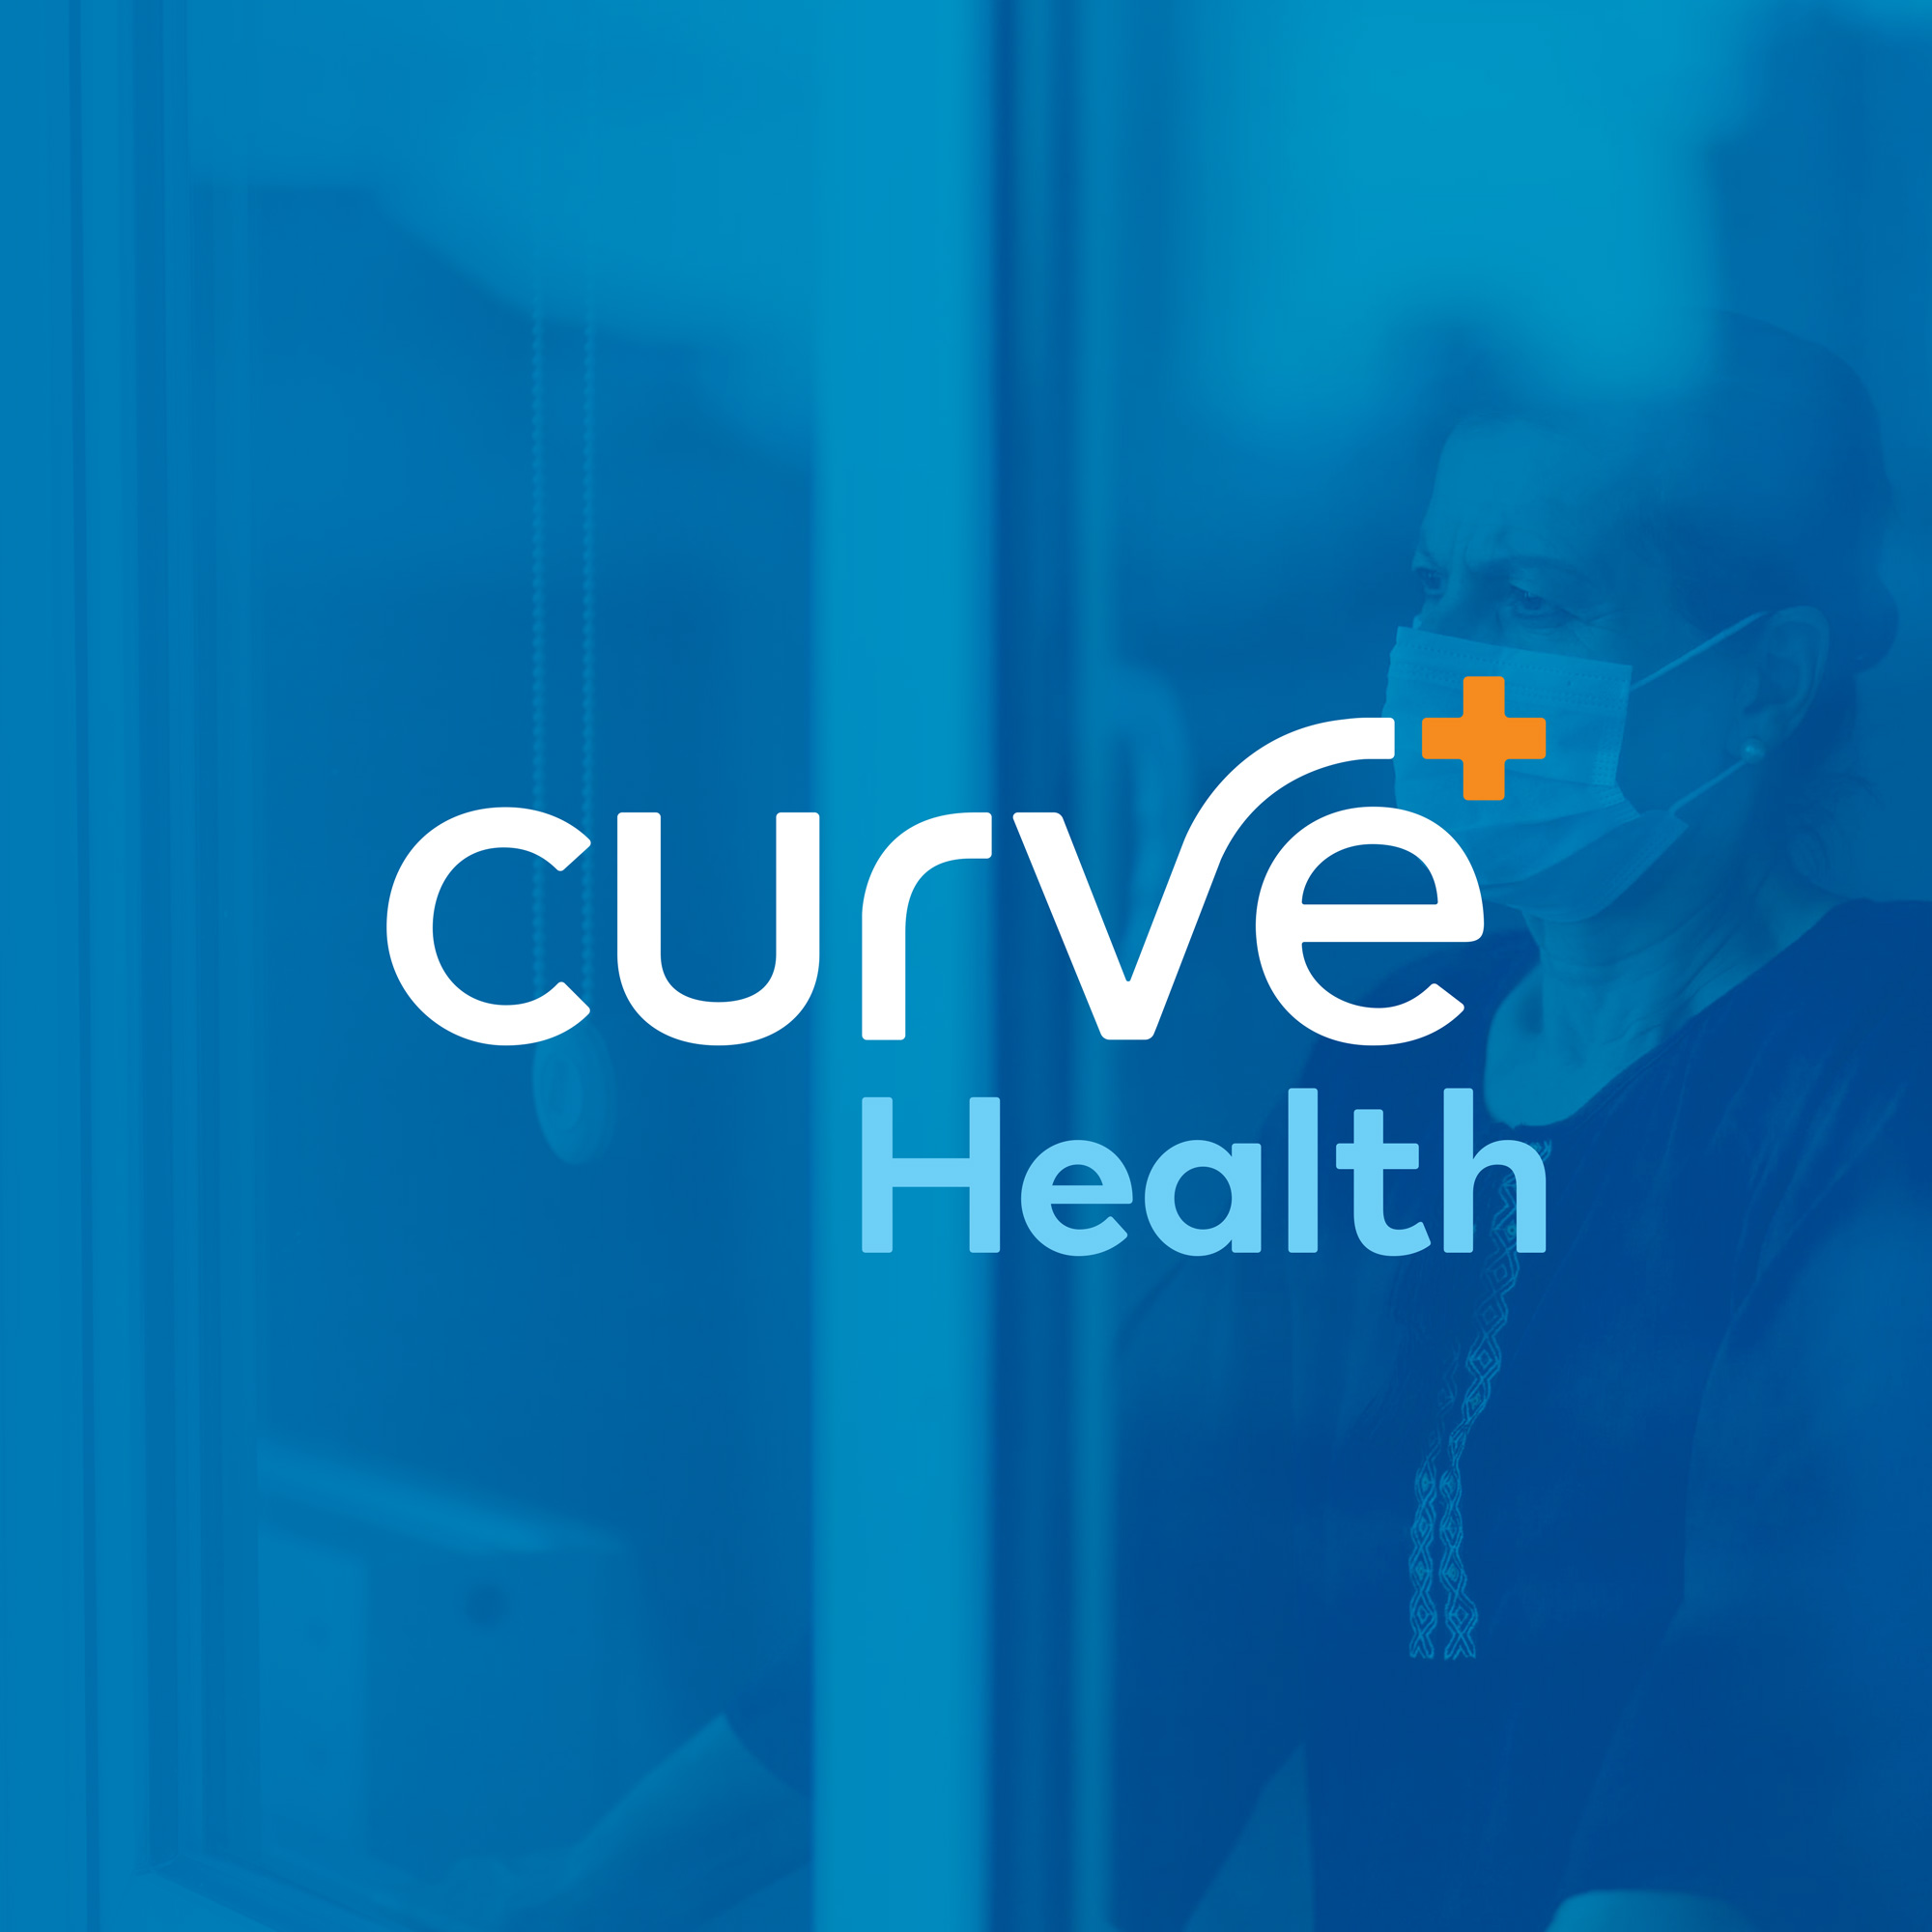 Ocean-and-Sea_Logos_Curve-Health-1-1